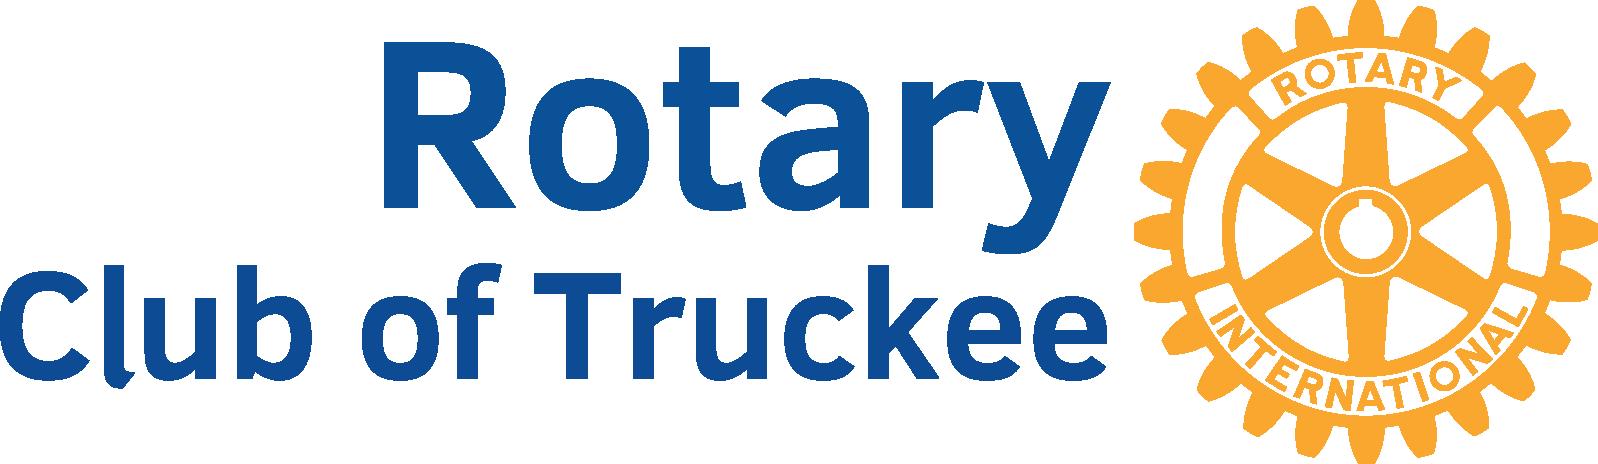 Truckee logo